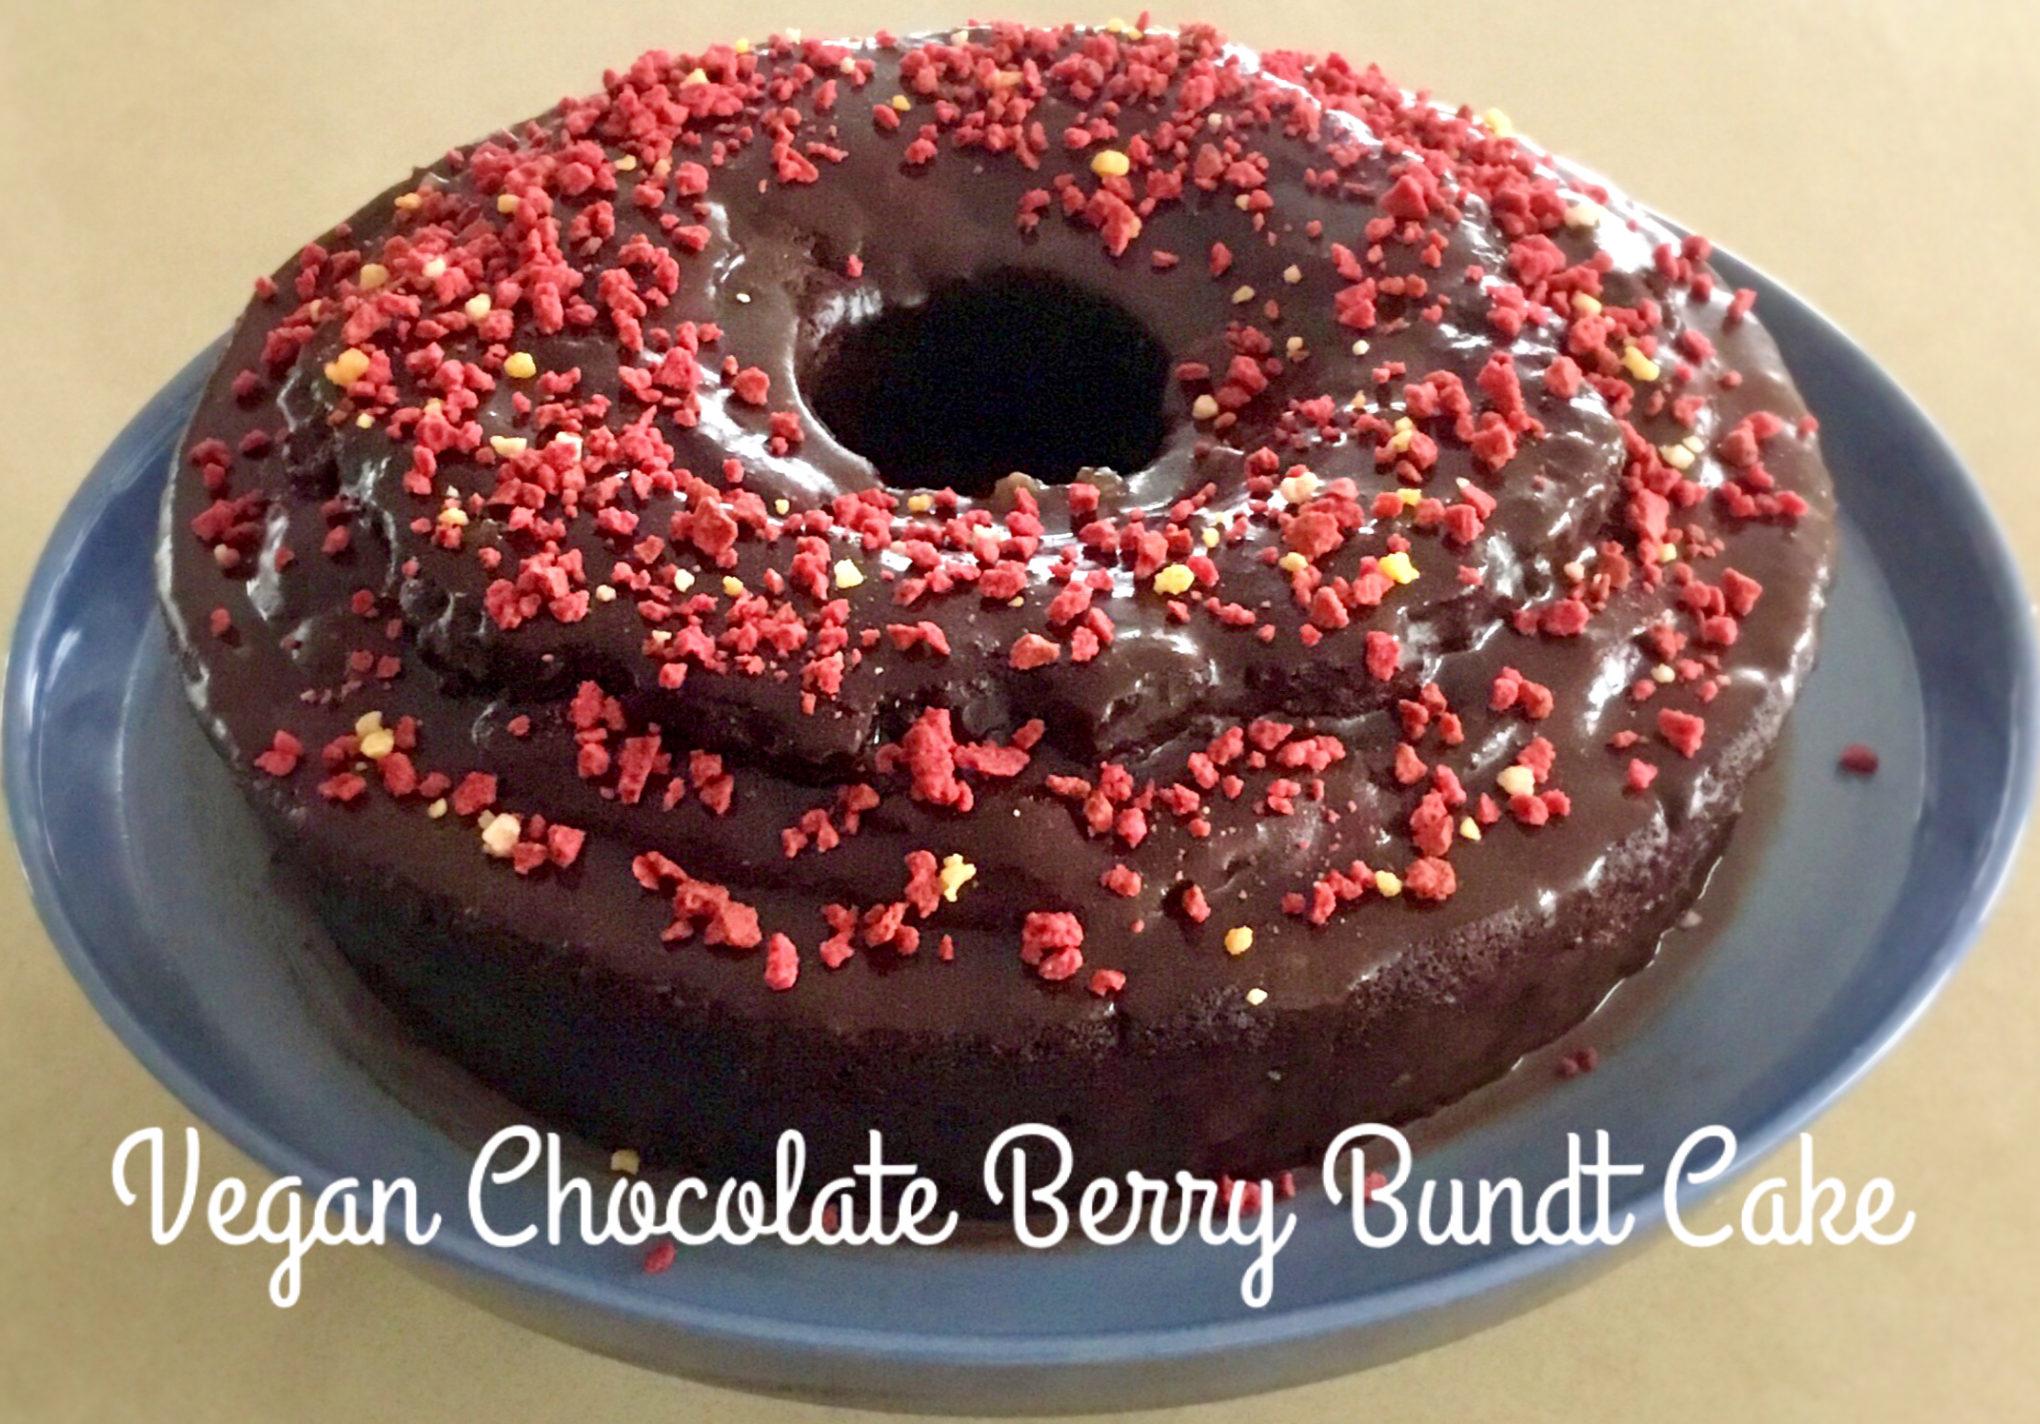 Photo of Vegan chocolate Berry Bundt cake on a blue cake stand